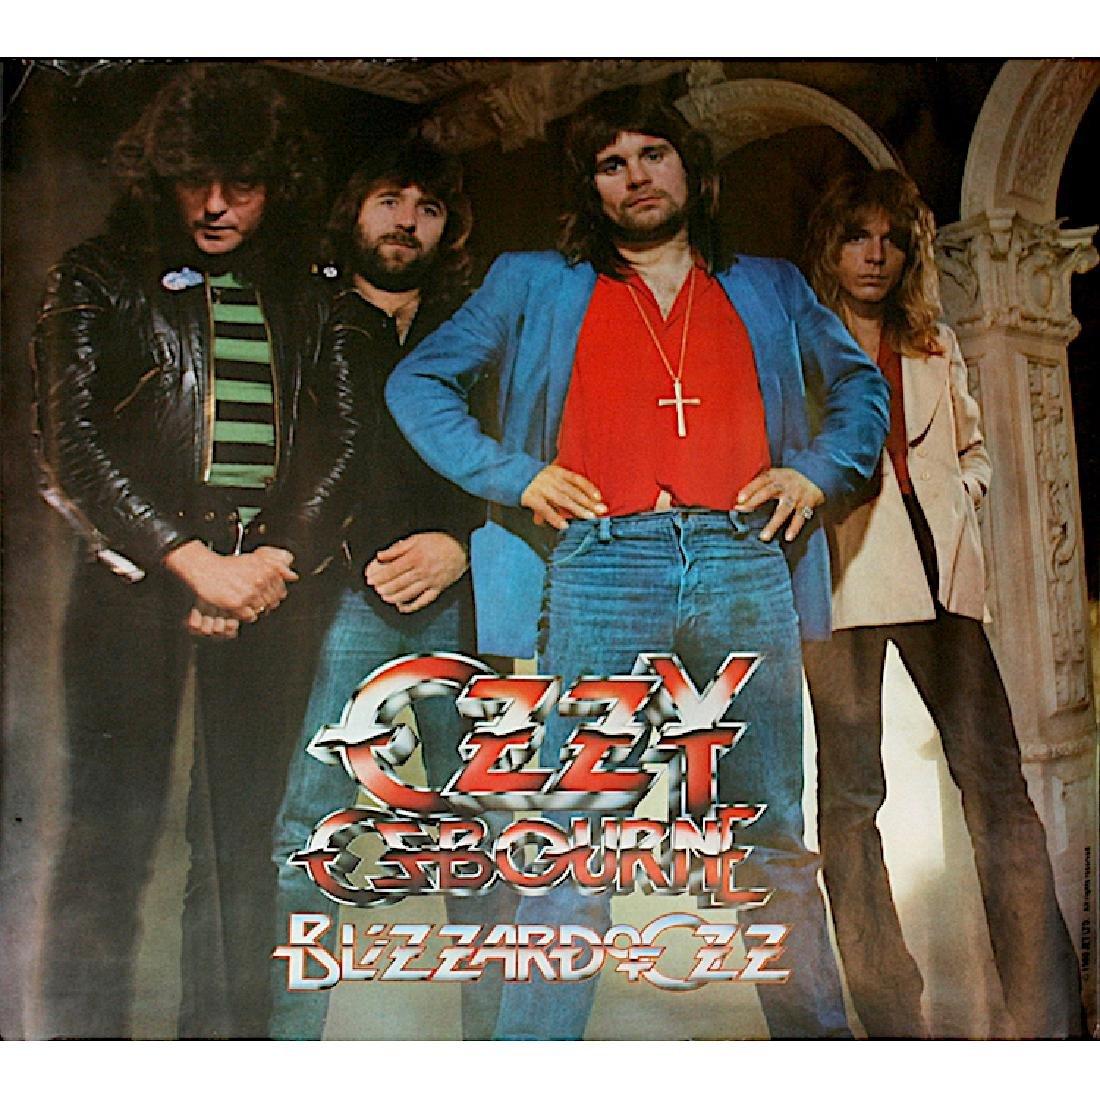 Ozzy Osbourne - Blizzard Of Ozz - Poster